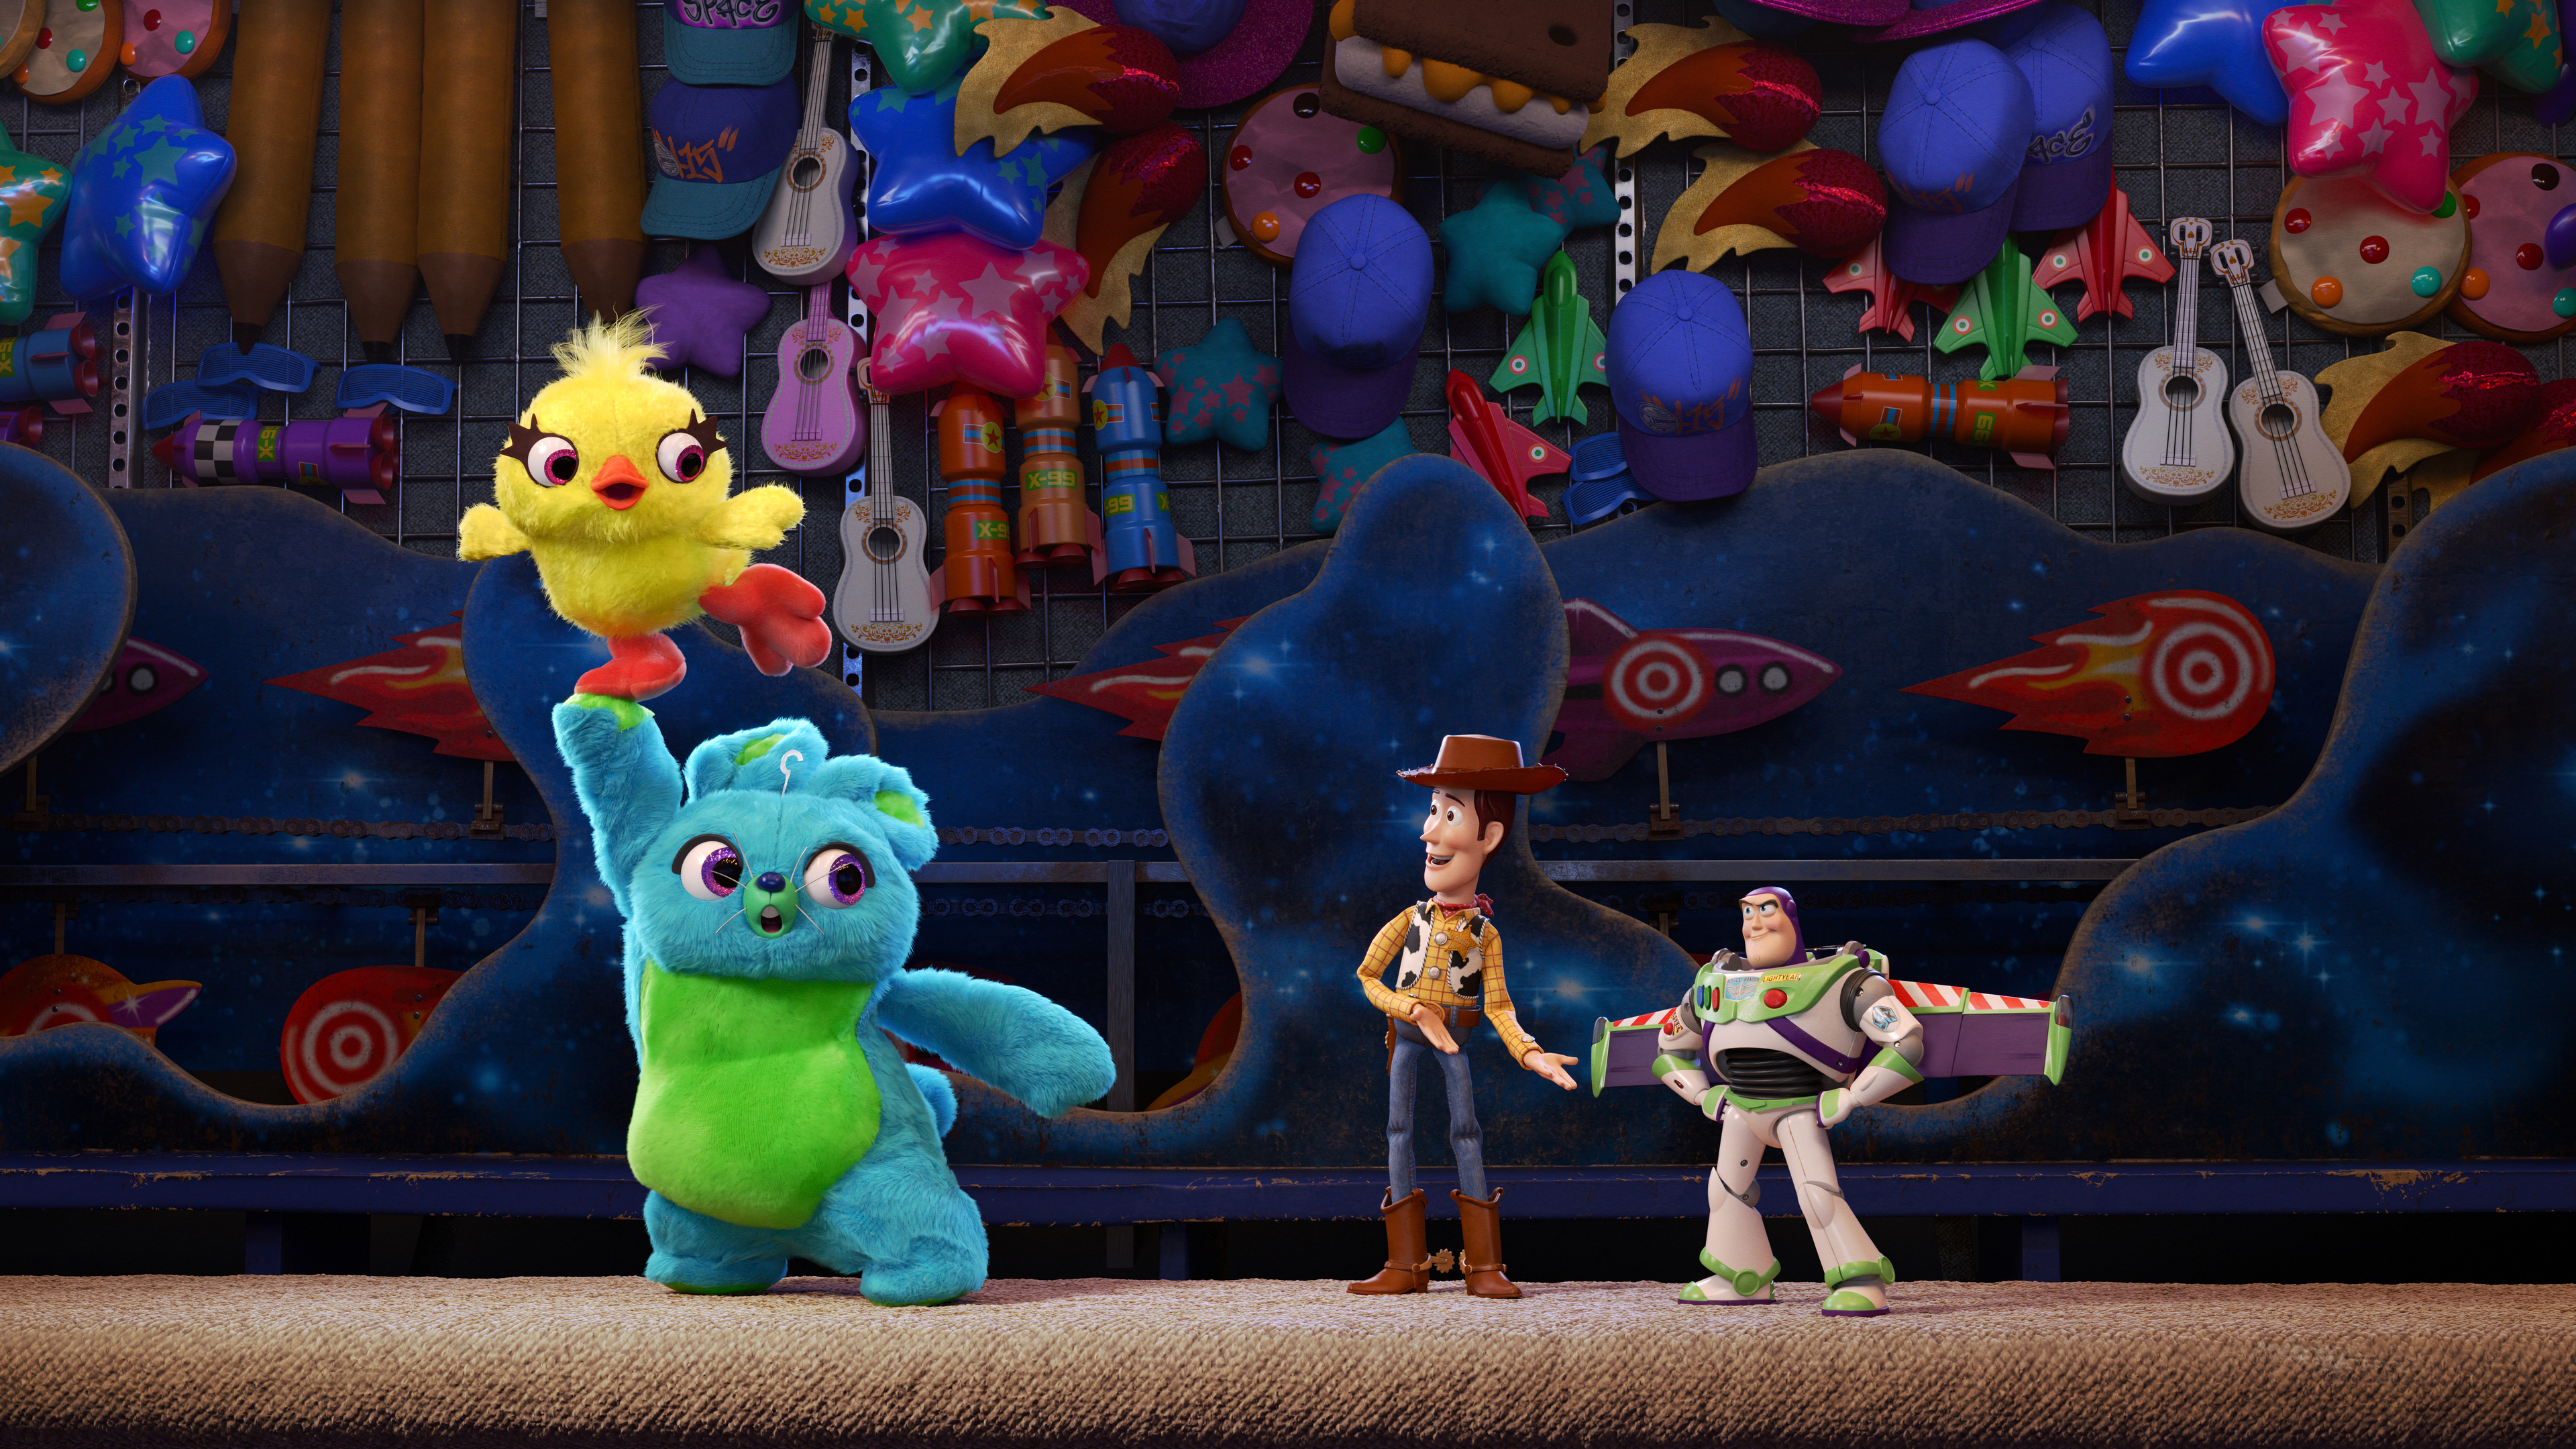 toy story 4 2019 4k 1555208560 - Toy Story 4 2019 4k - toy story 4 wallpapers, movies wallpapers, hd-wallpapers, animated movies wallpapers, 4k-wallpapers, 2019 movies wallpapers